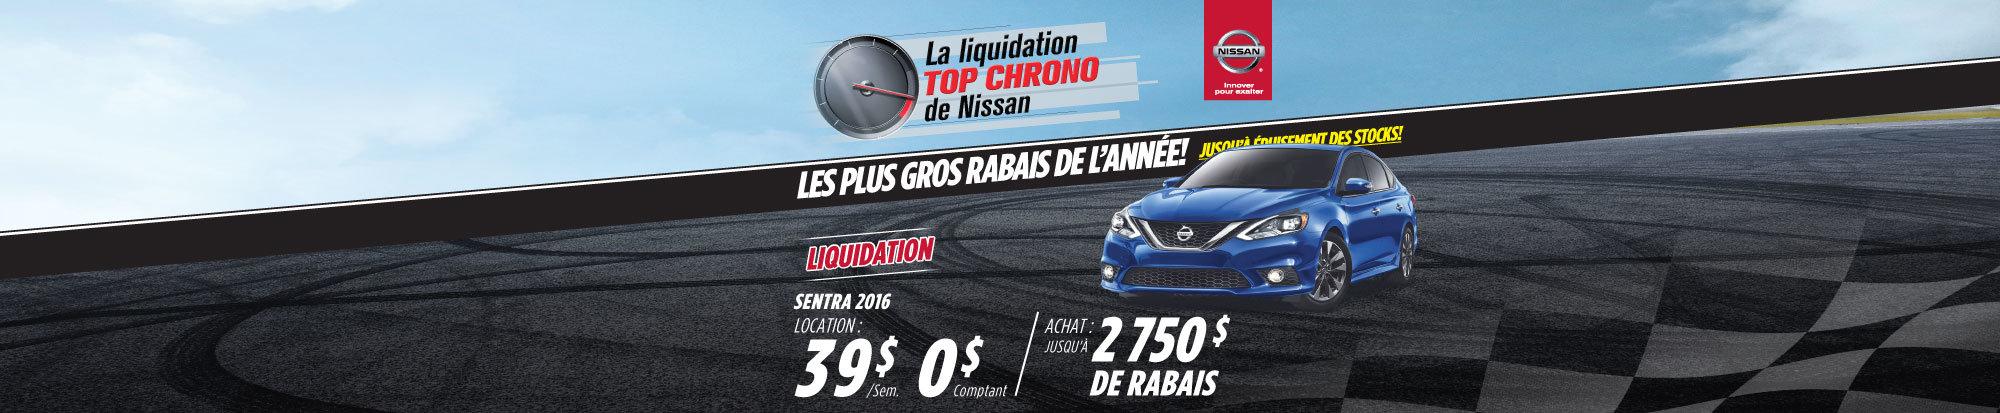 La liquidation top chrono de Nissan  - Sentra 2016